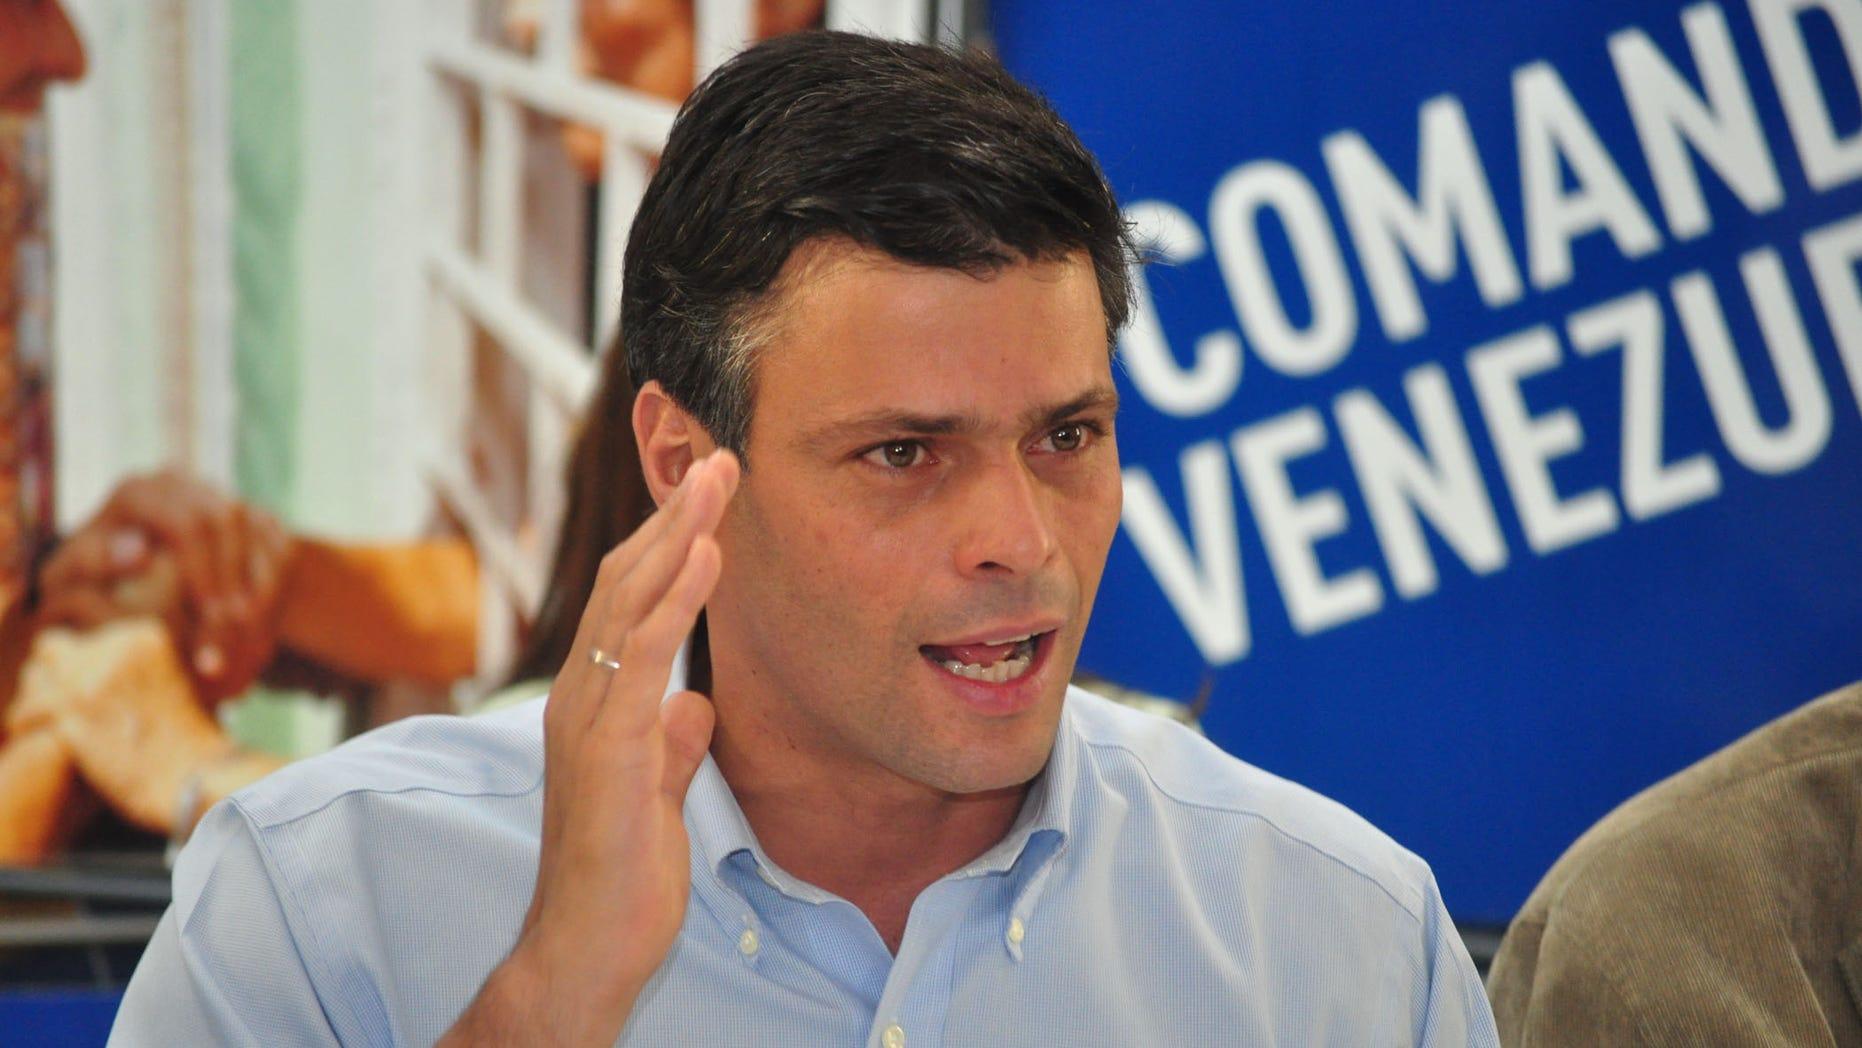 Former Venezuelan presidential contender Leopoldo Lopez